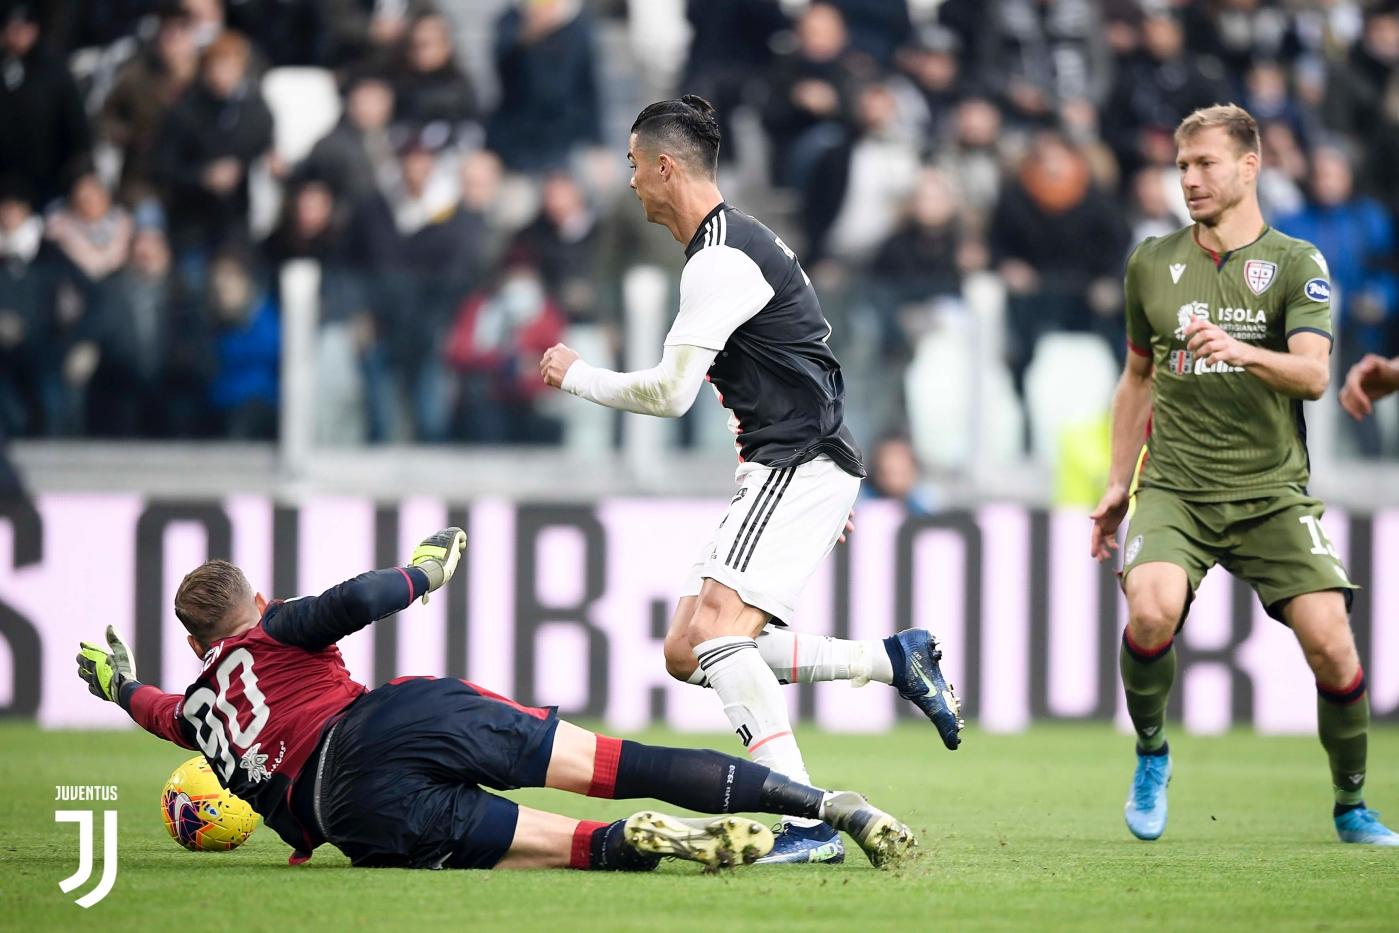 Consigue Cristiano Ronaldo hat-trick- Foto: Juventus